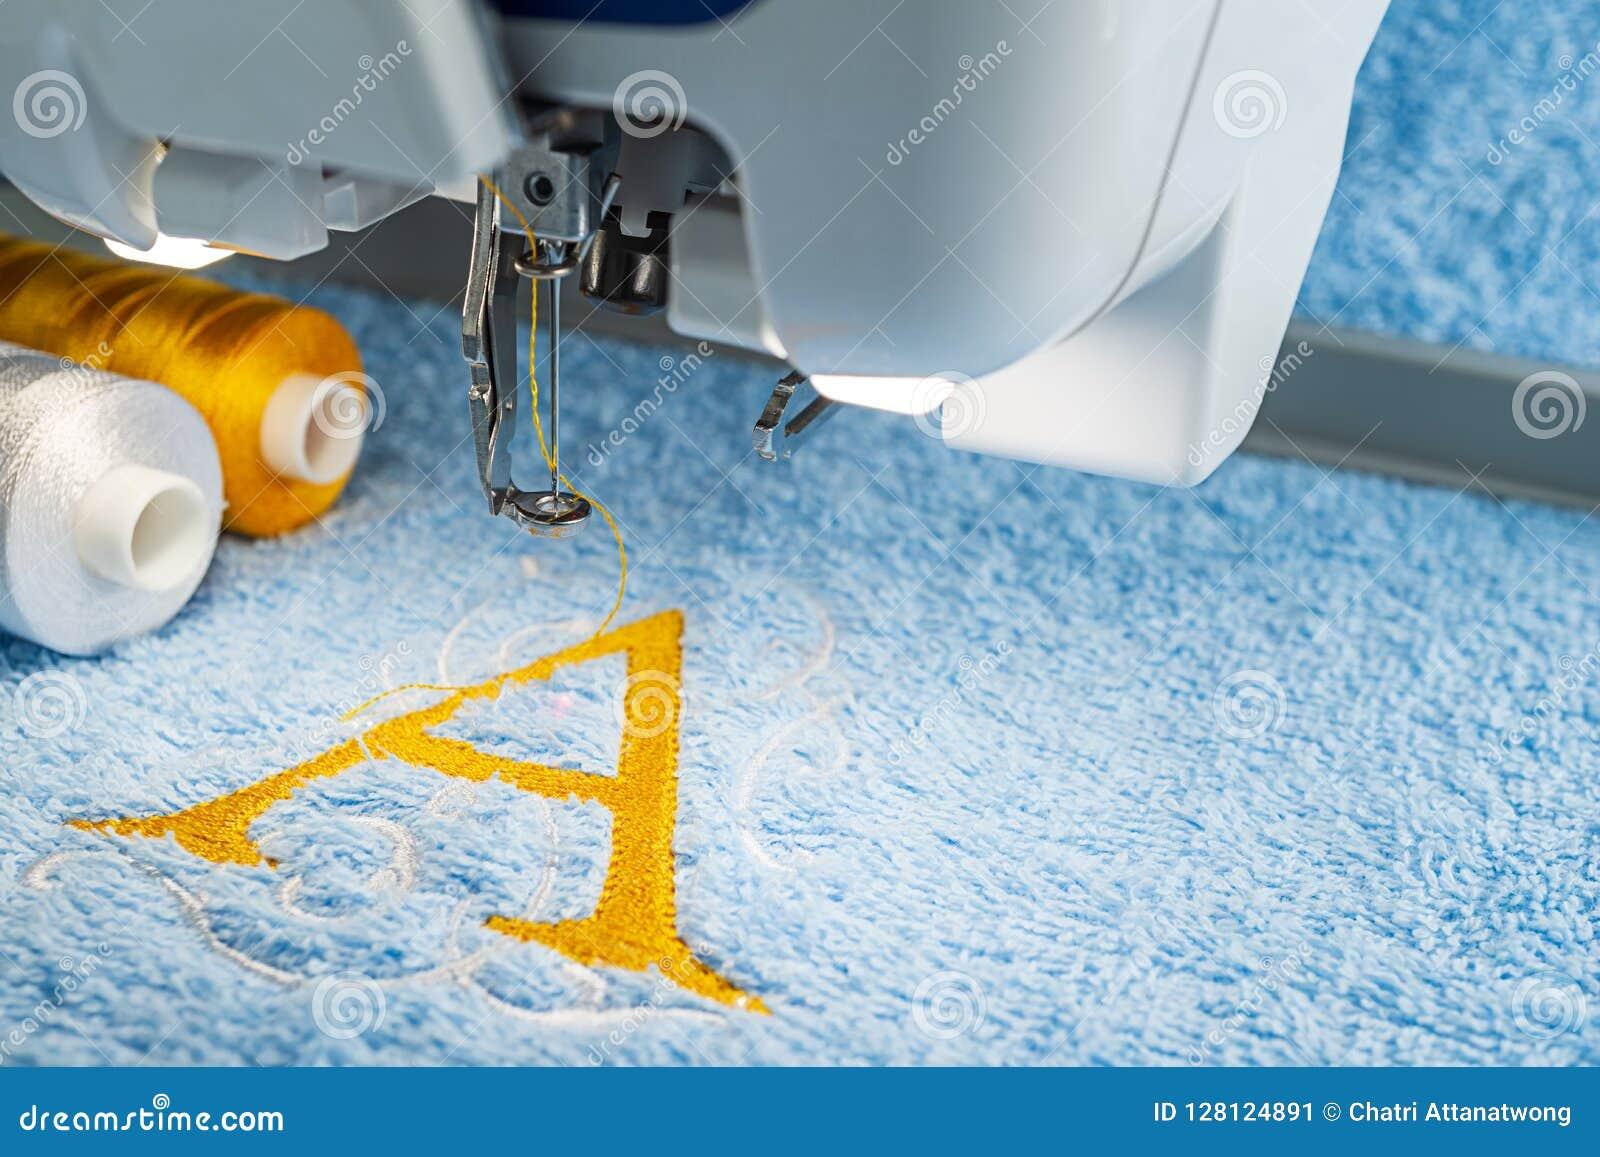 Embroidery Machine And Monogram Logo Design Stock Image - Image of